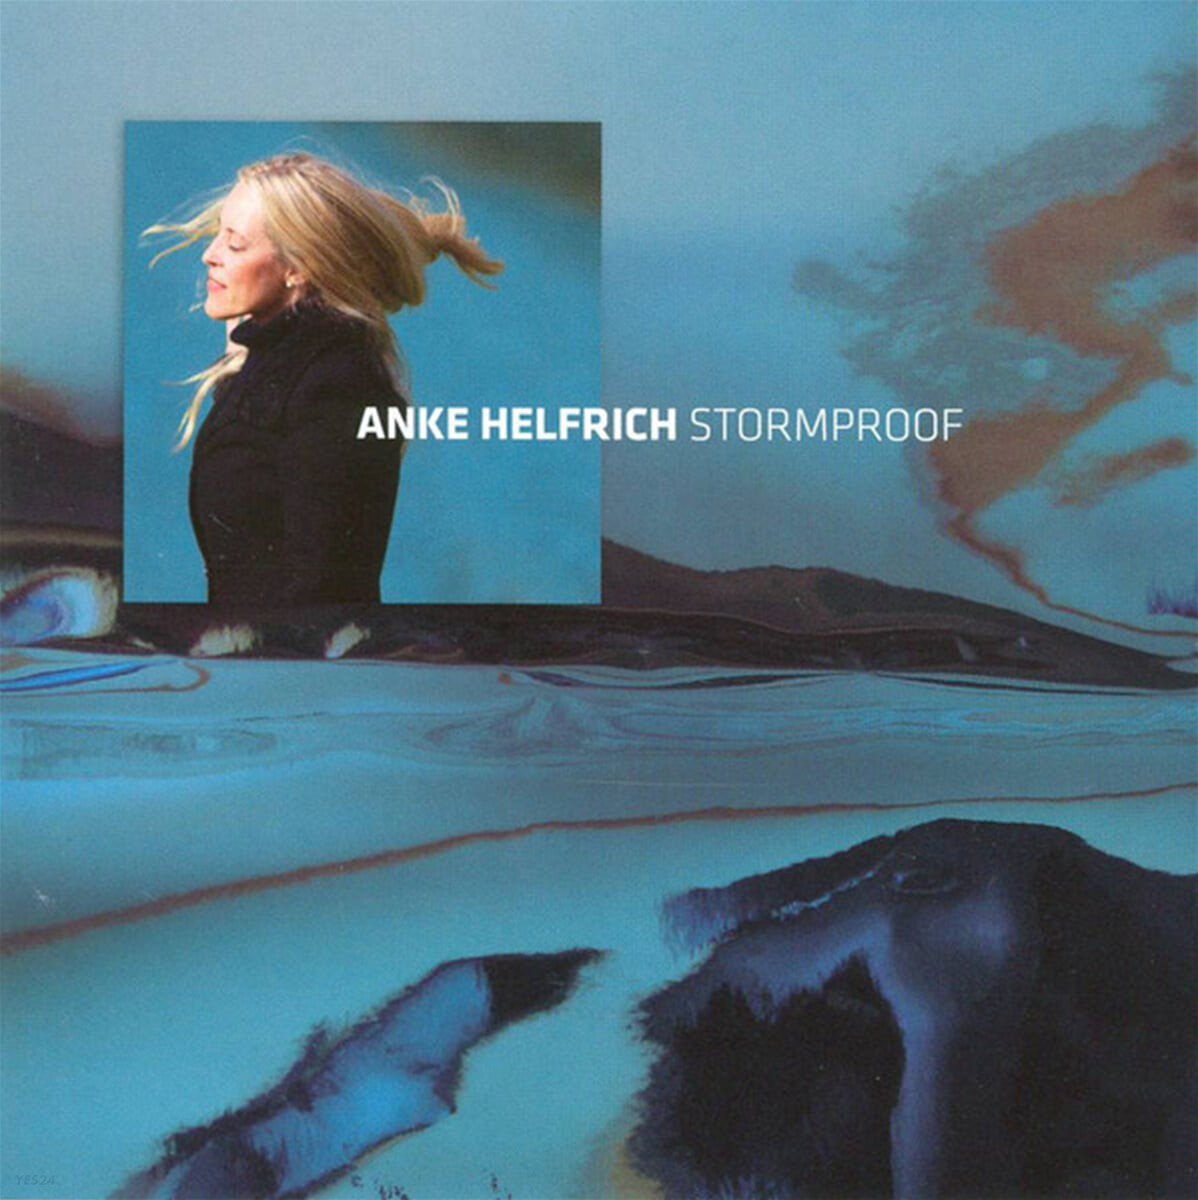 Anke Helfrich (안케 헬프리히) - Stormproof